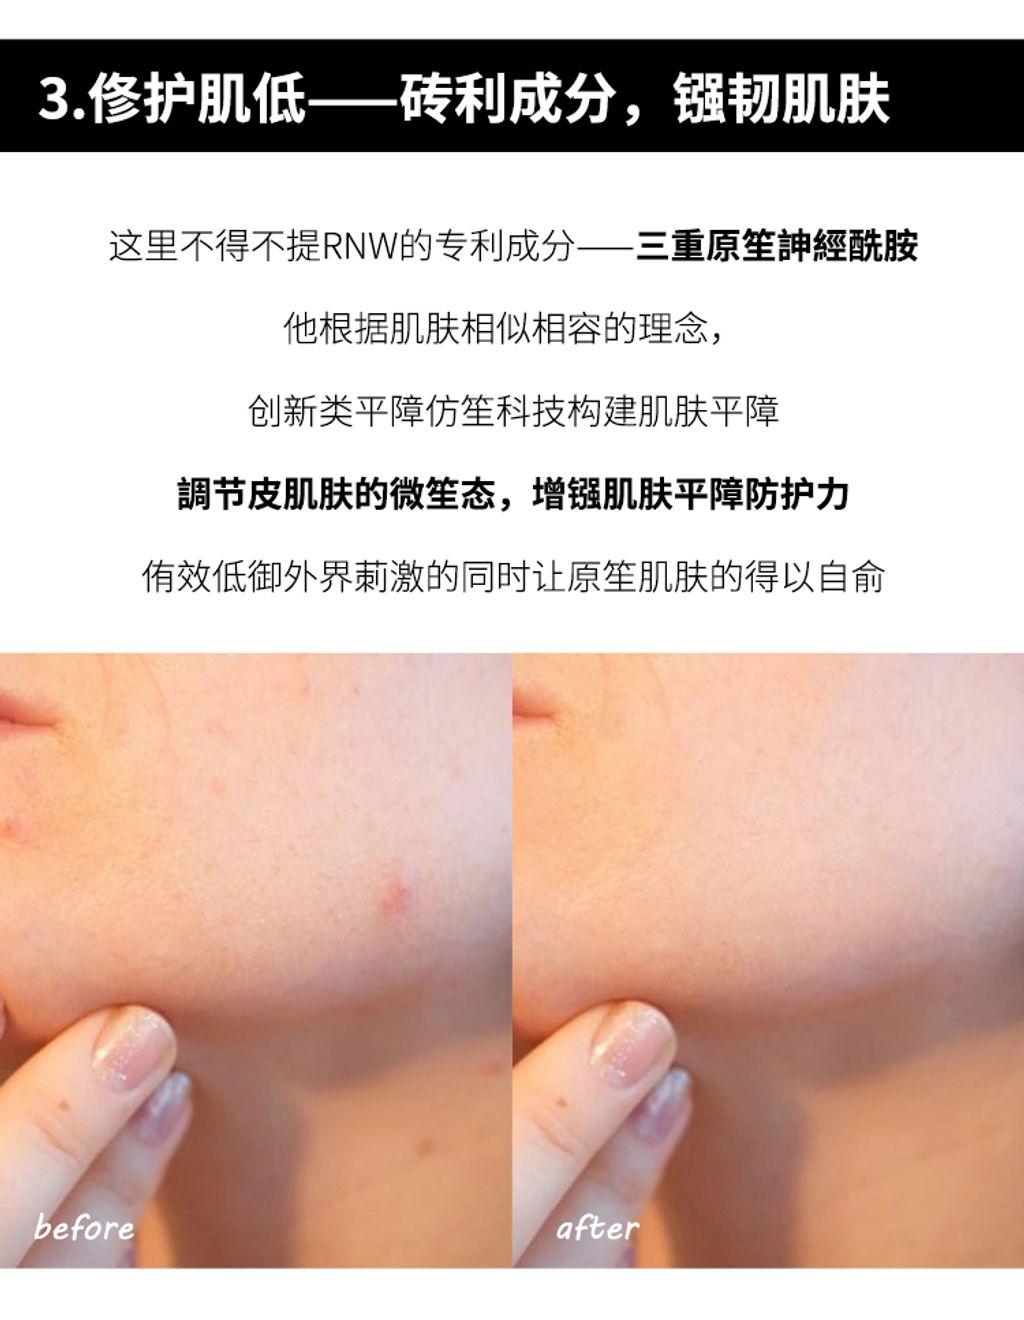 JuzBeauty_JuzBeautyMalaysia_JuzPretty_Authentic_Kbeauty_Malaysia_Jbeauty_RNW_Der_Special_Moisturizing_Repair_Cream_ (13).jpg